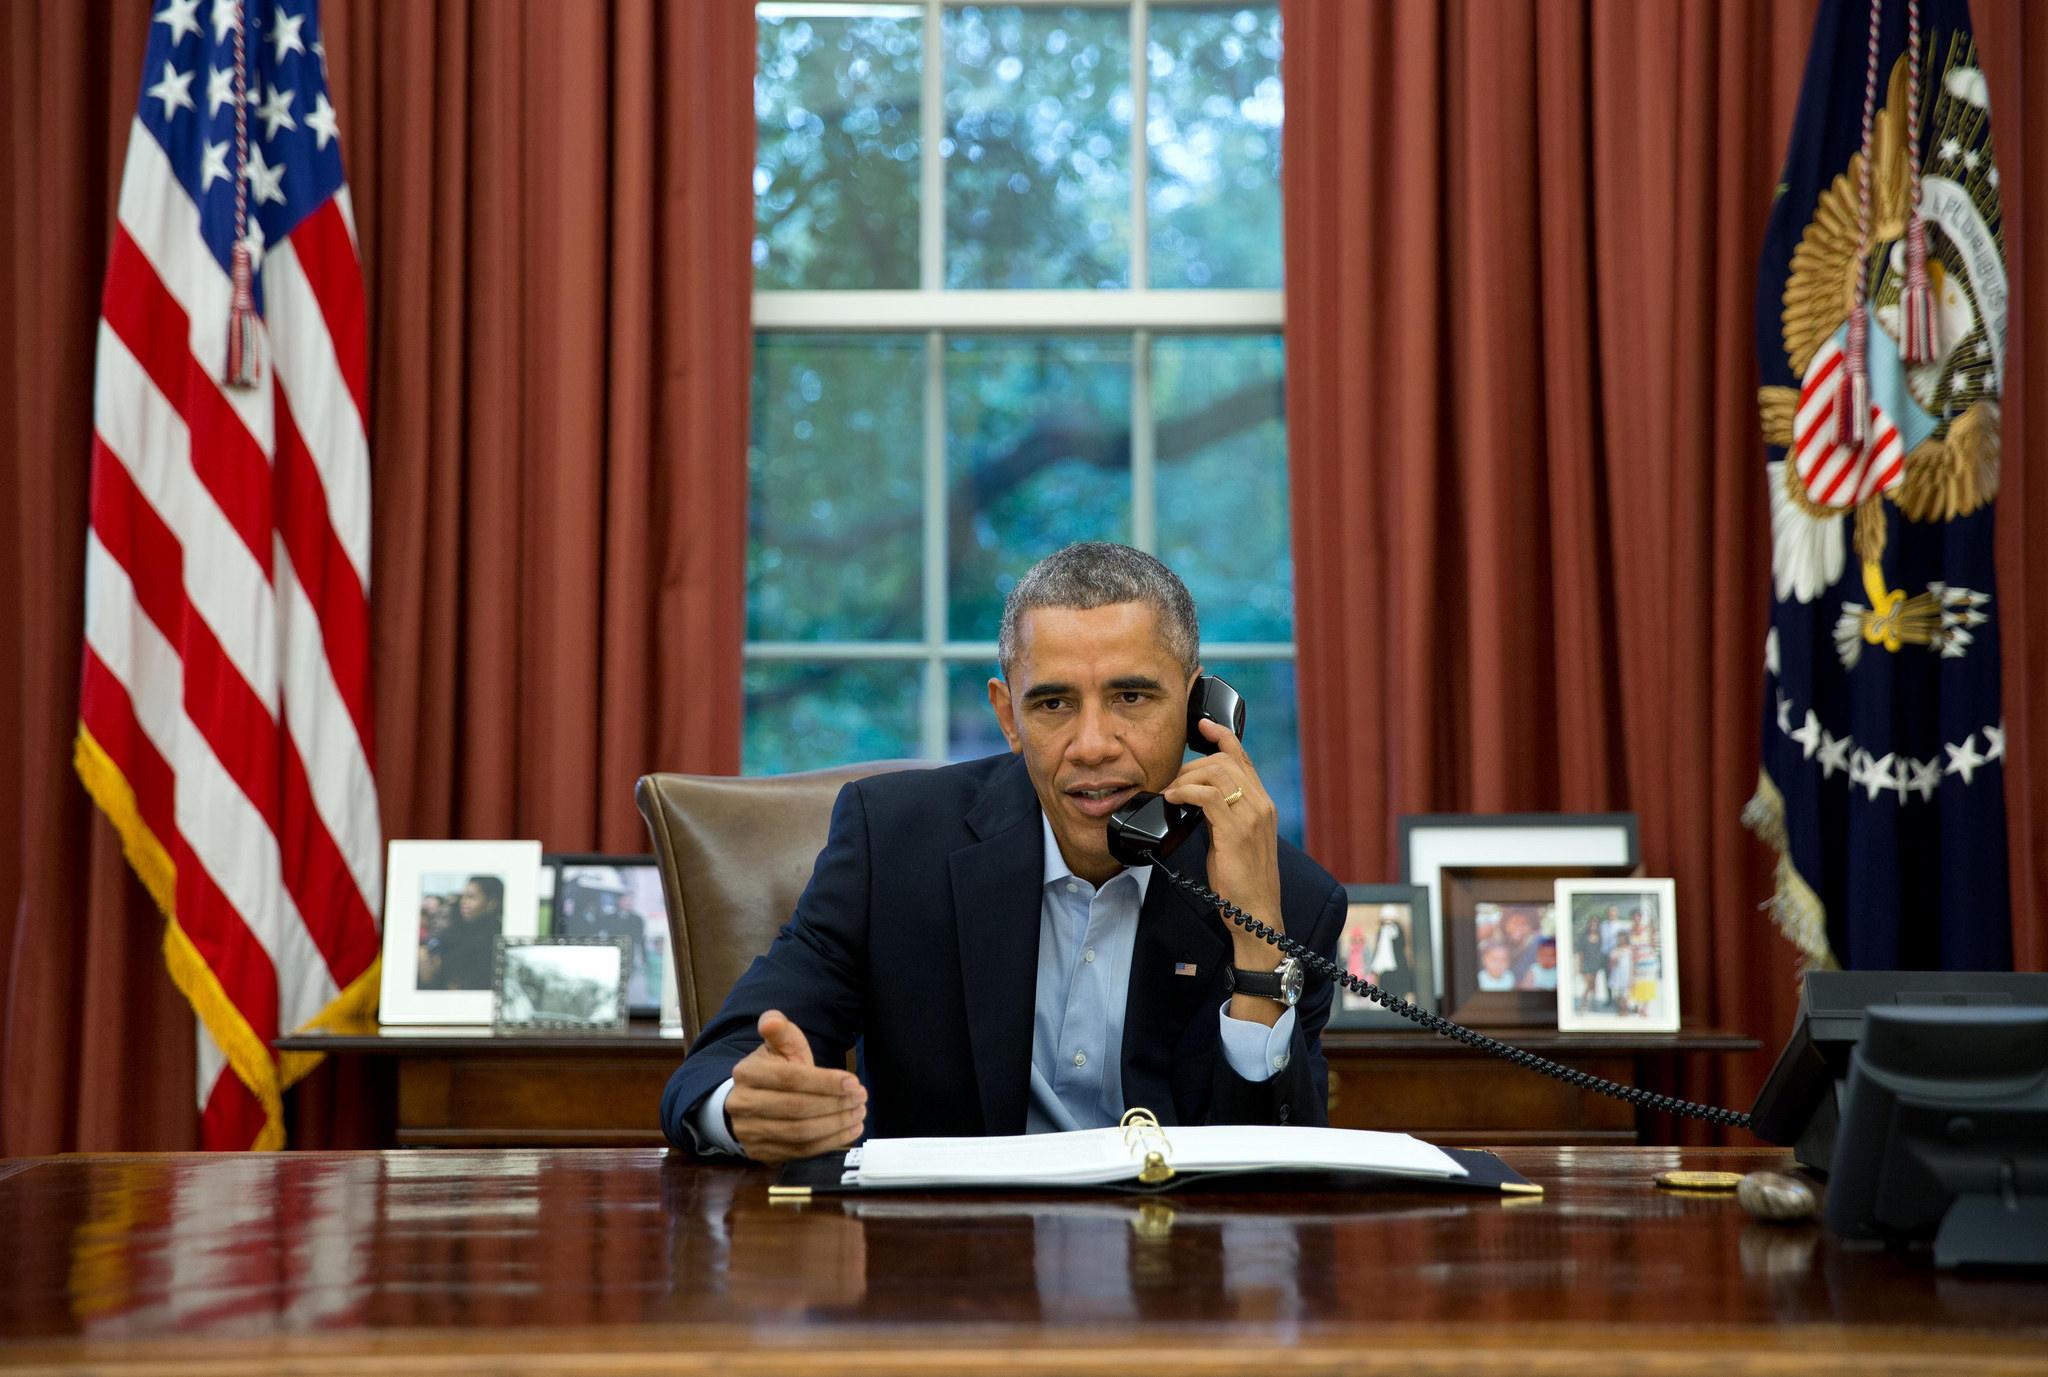 obamas oval office. President Barack Obama In The Oval Office On November 1, 2014. Obamas